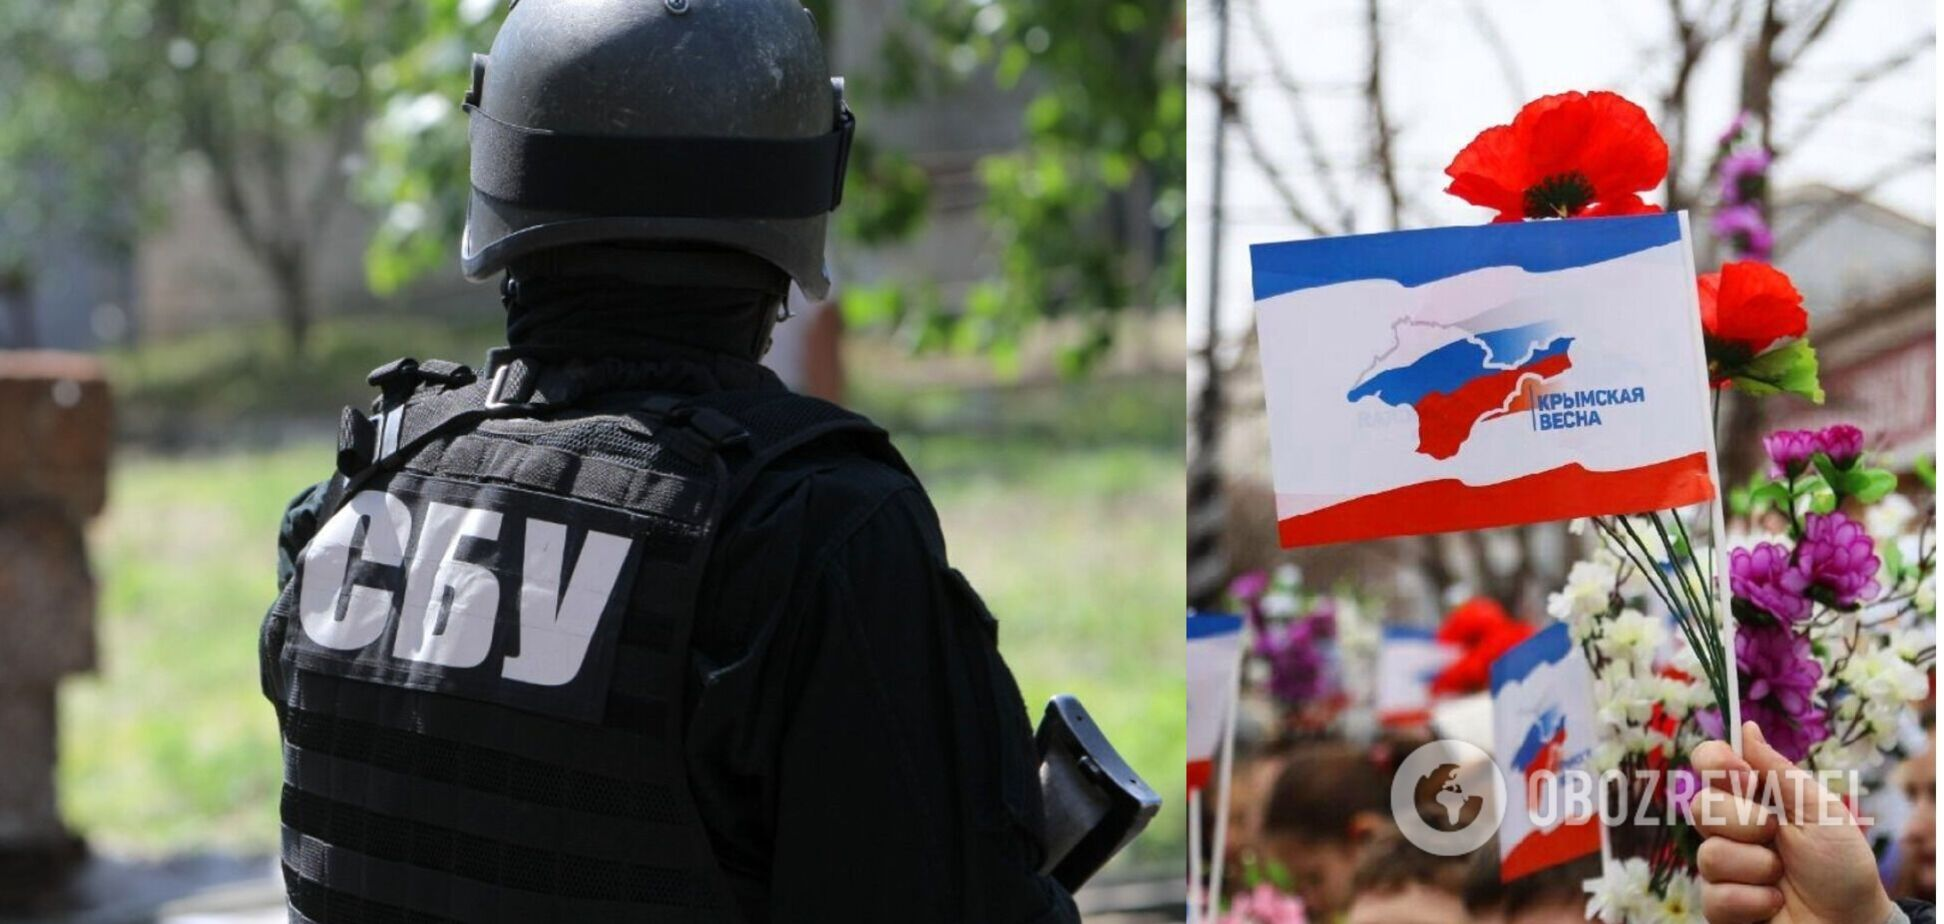 СБУ затримала активіста 'кримської весни'. Фото